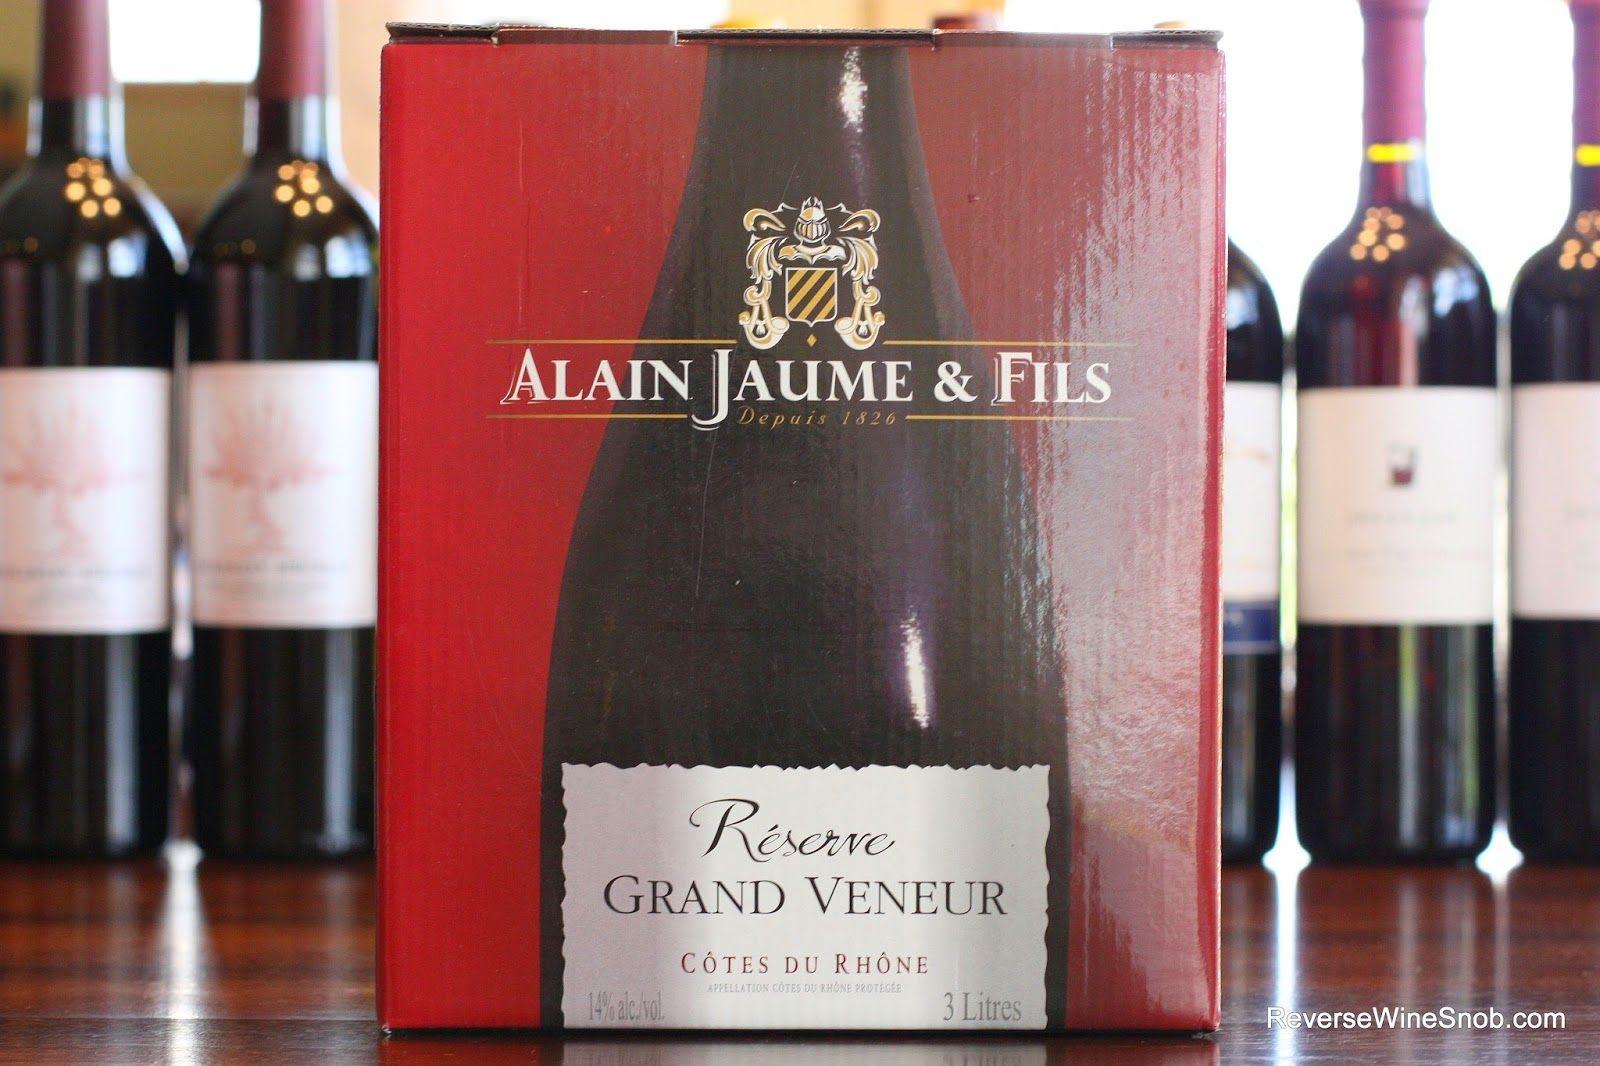 The Reverse Wine Snob The Best Box Wines Alain Jaume Fils Grand Veneur Cotes Du Rhone Reserve 2012 A Dynamite Da Wine Snob Wine Recommendations Wine Down